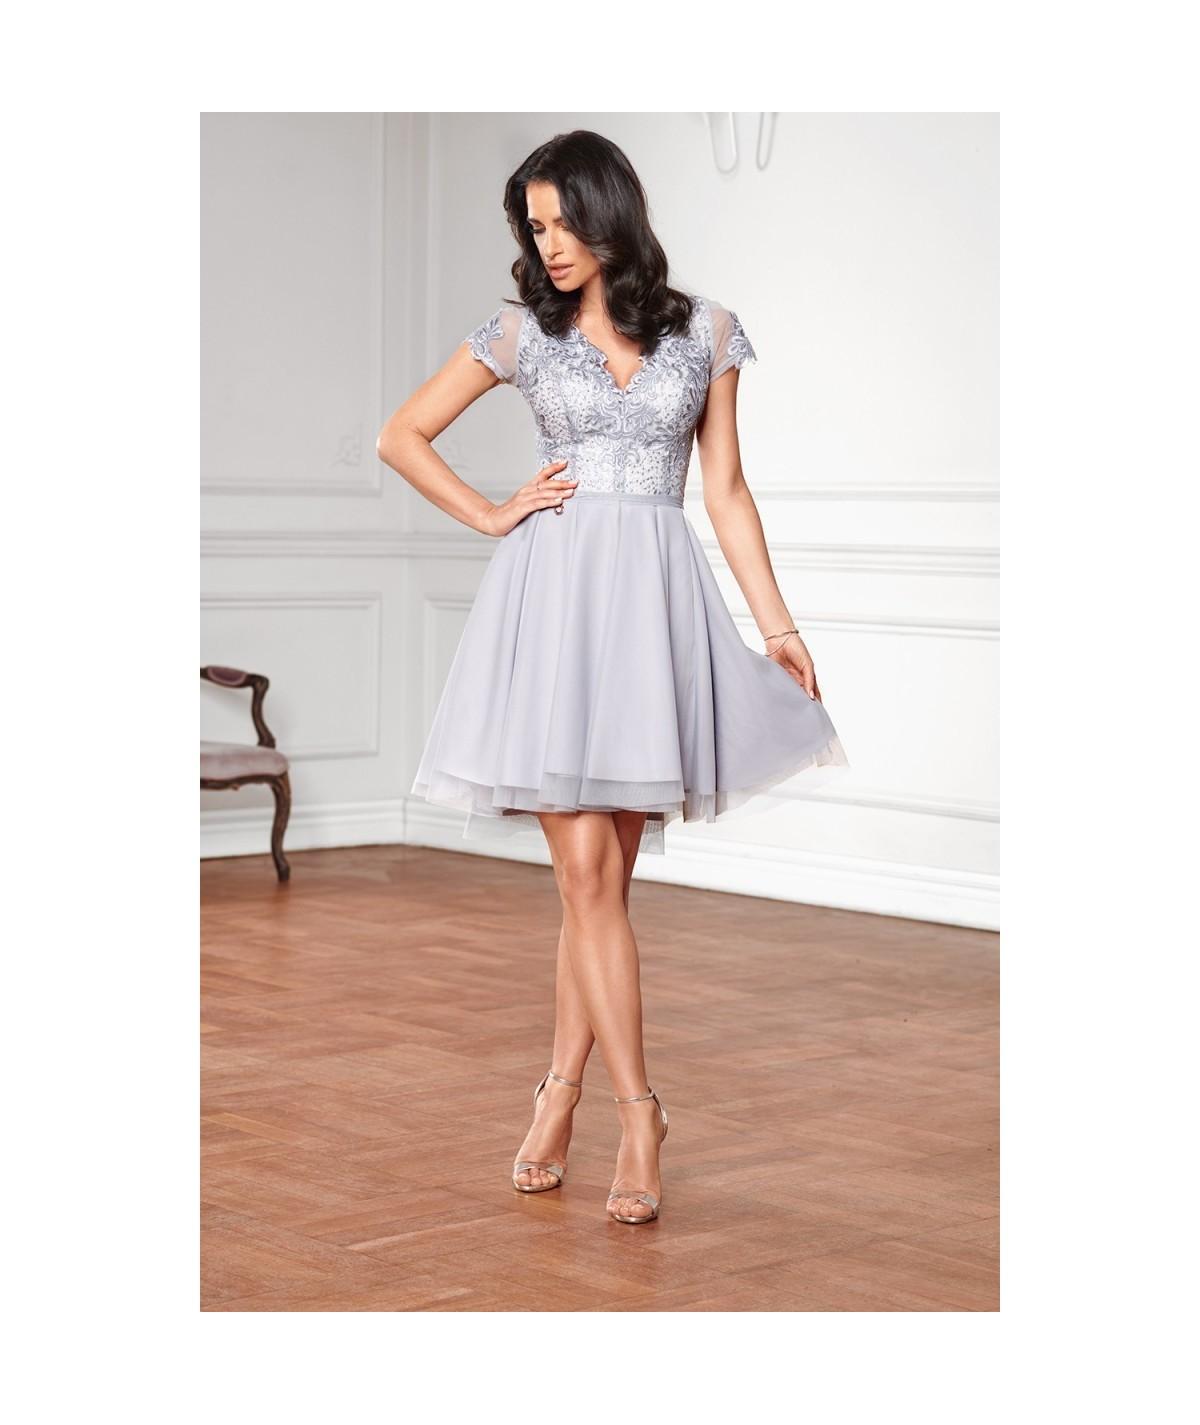 919b45d1f9 Nowy Obniżka! koktajlowa sukienka z koronką i tiulem Lottie - chaber